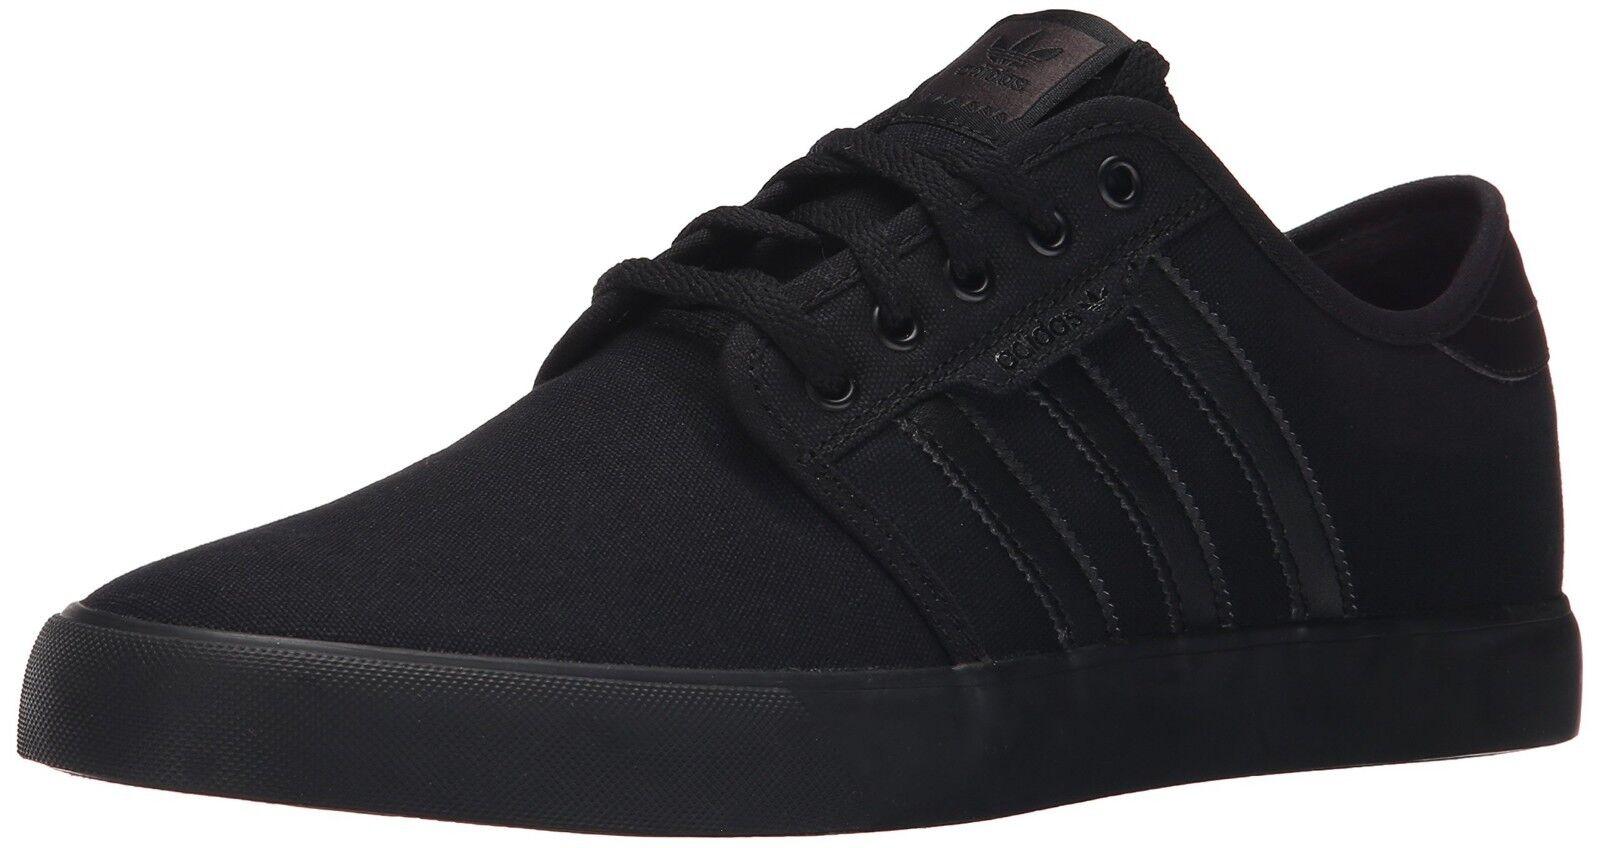 Adidas scarpe seeley nero tela Uomo scarpe Adidas nuove in scatola 925d35